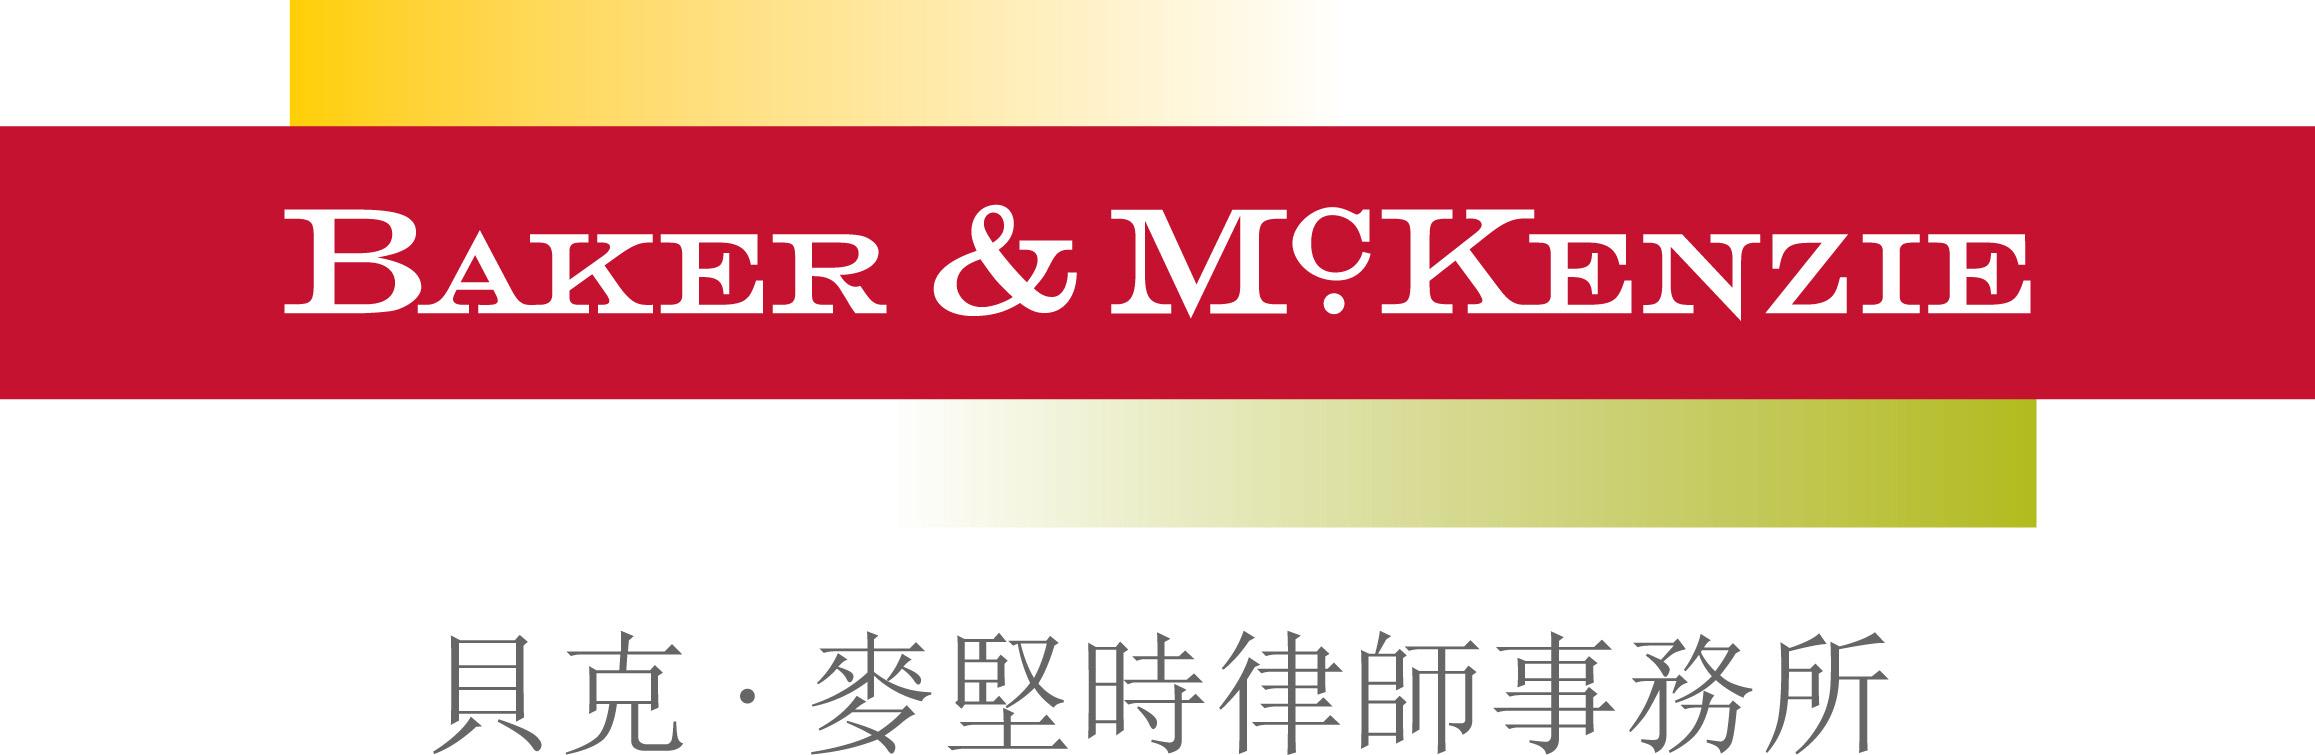 Baker & McKenzie profile banner